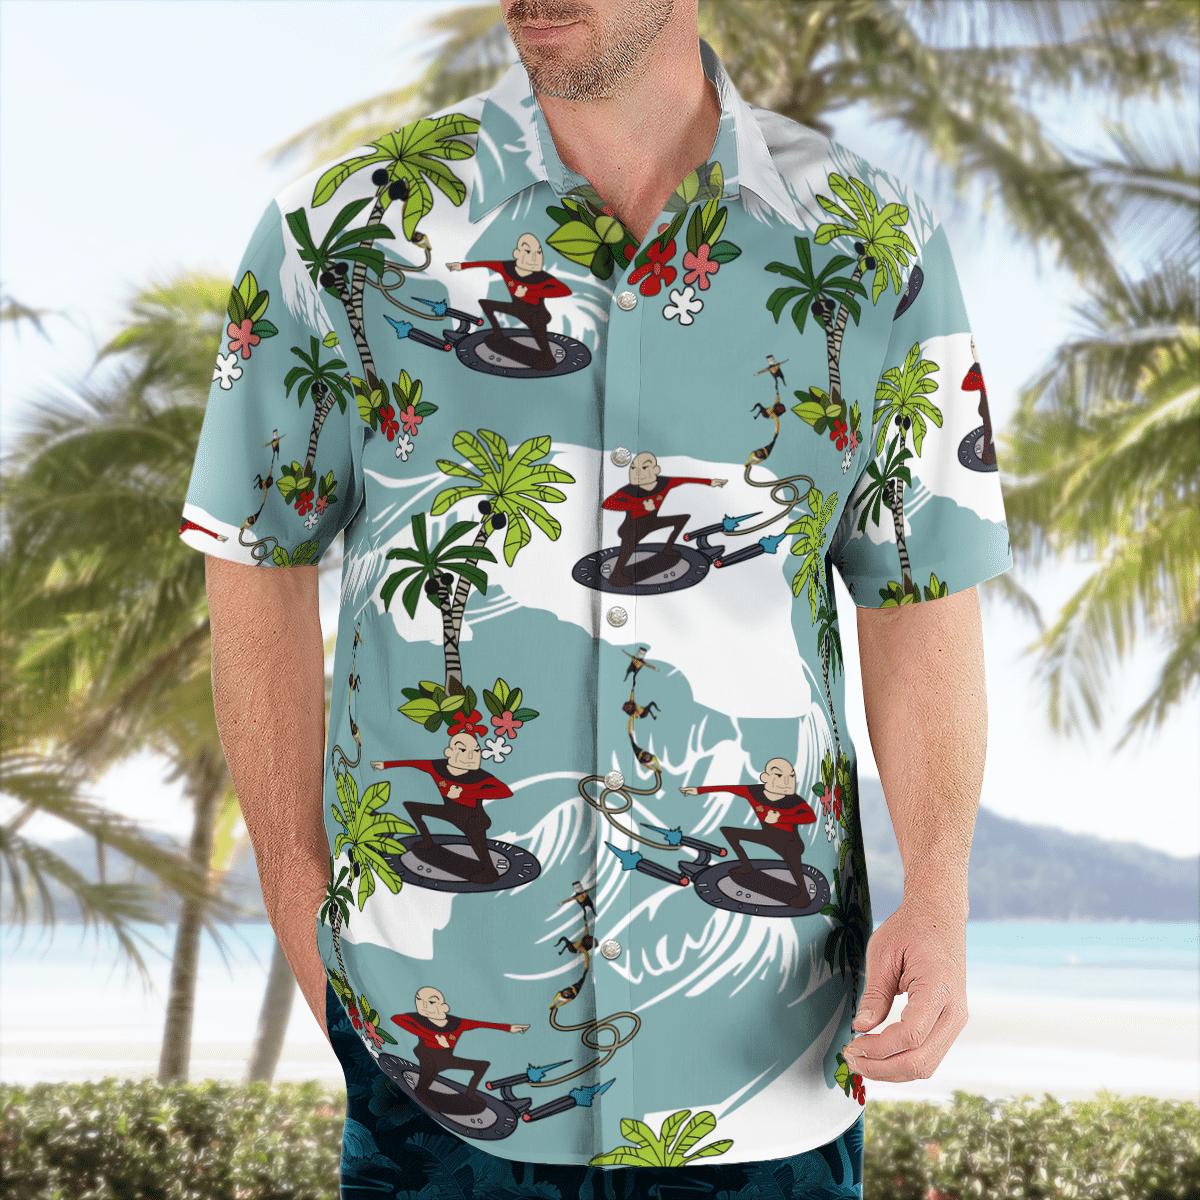 Star Trek Surfing Hawaiian shirt - LIMITED EDITION